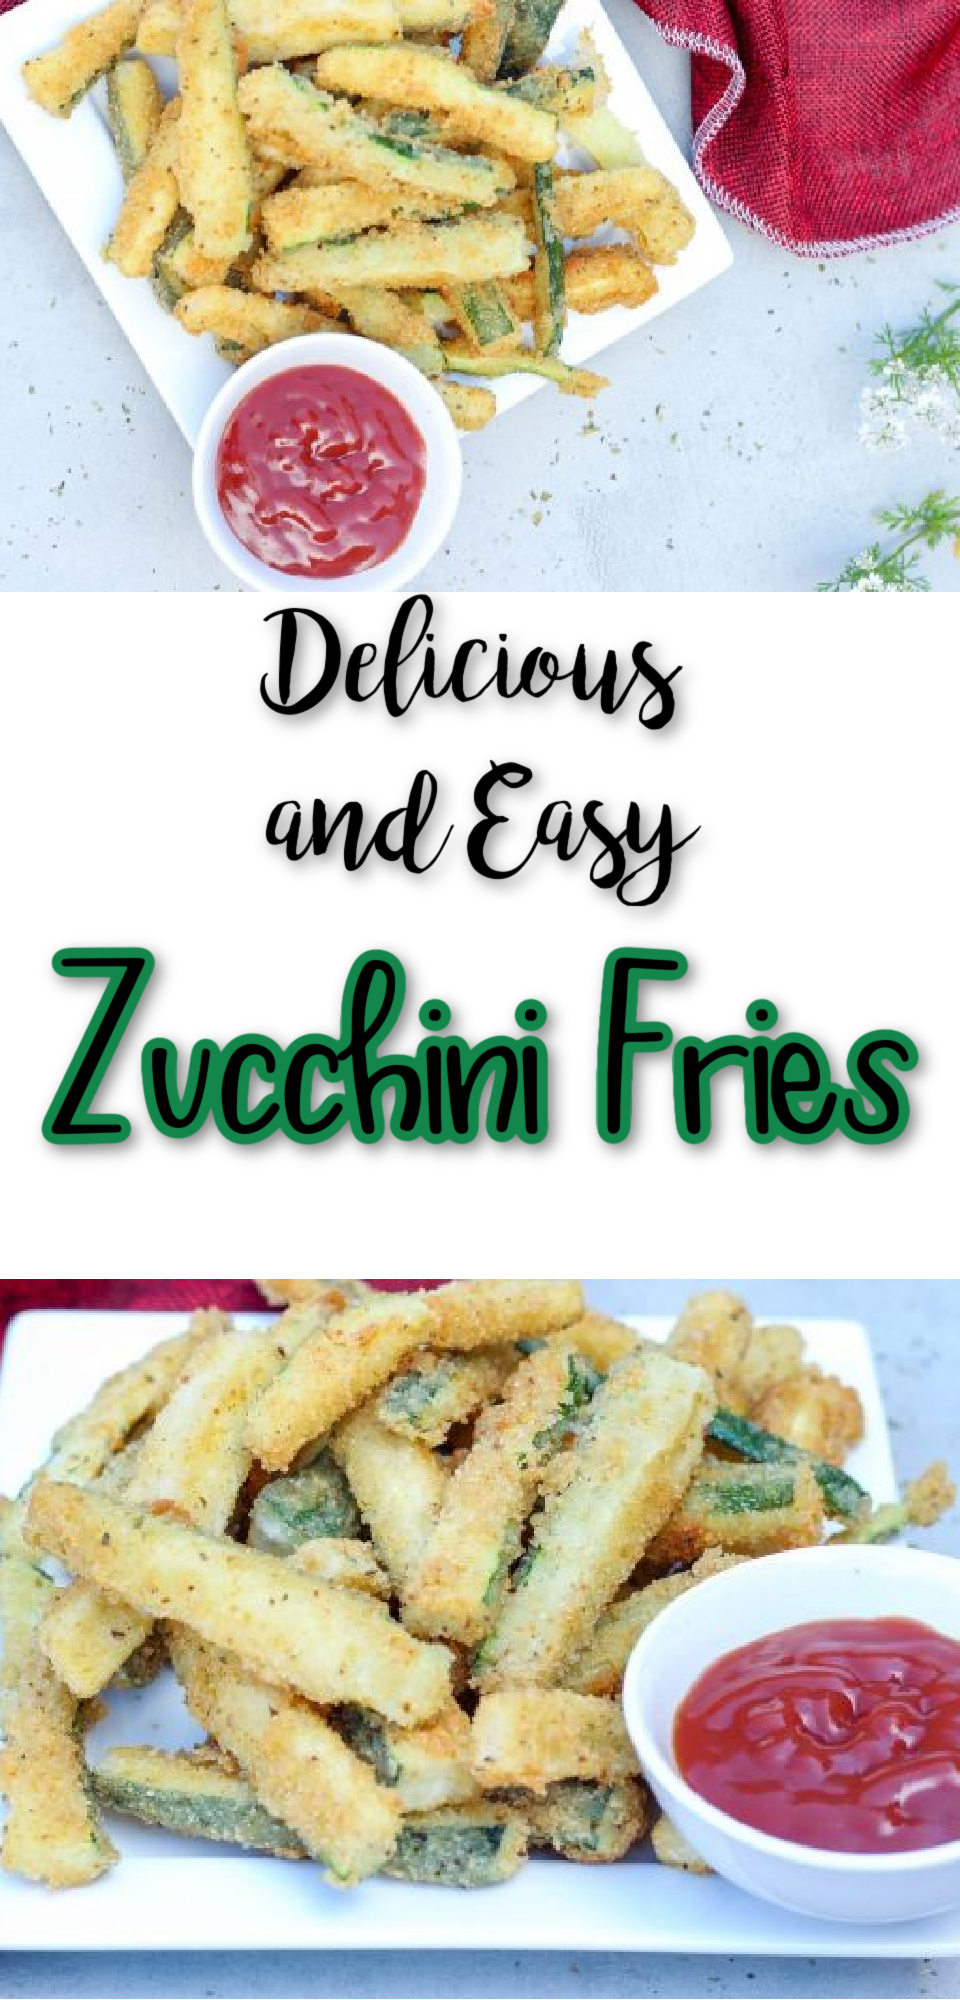 Zucchini Fries via @simplysidedishes89